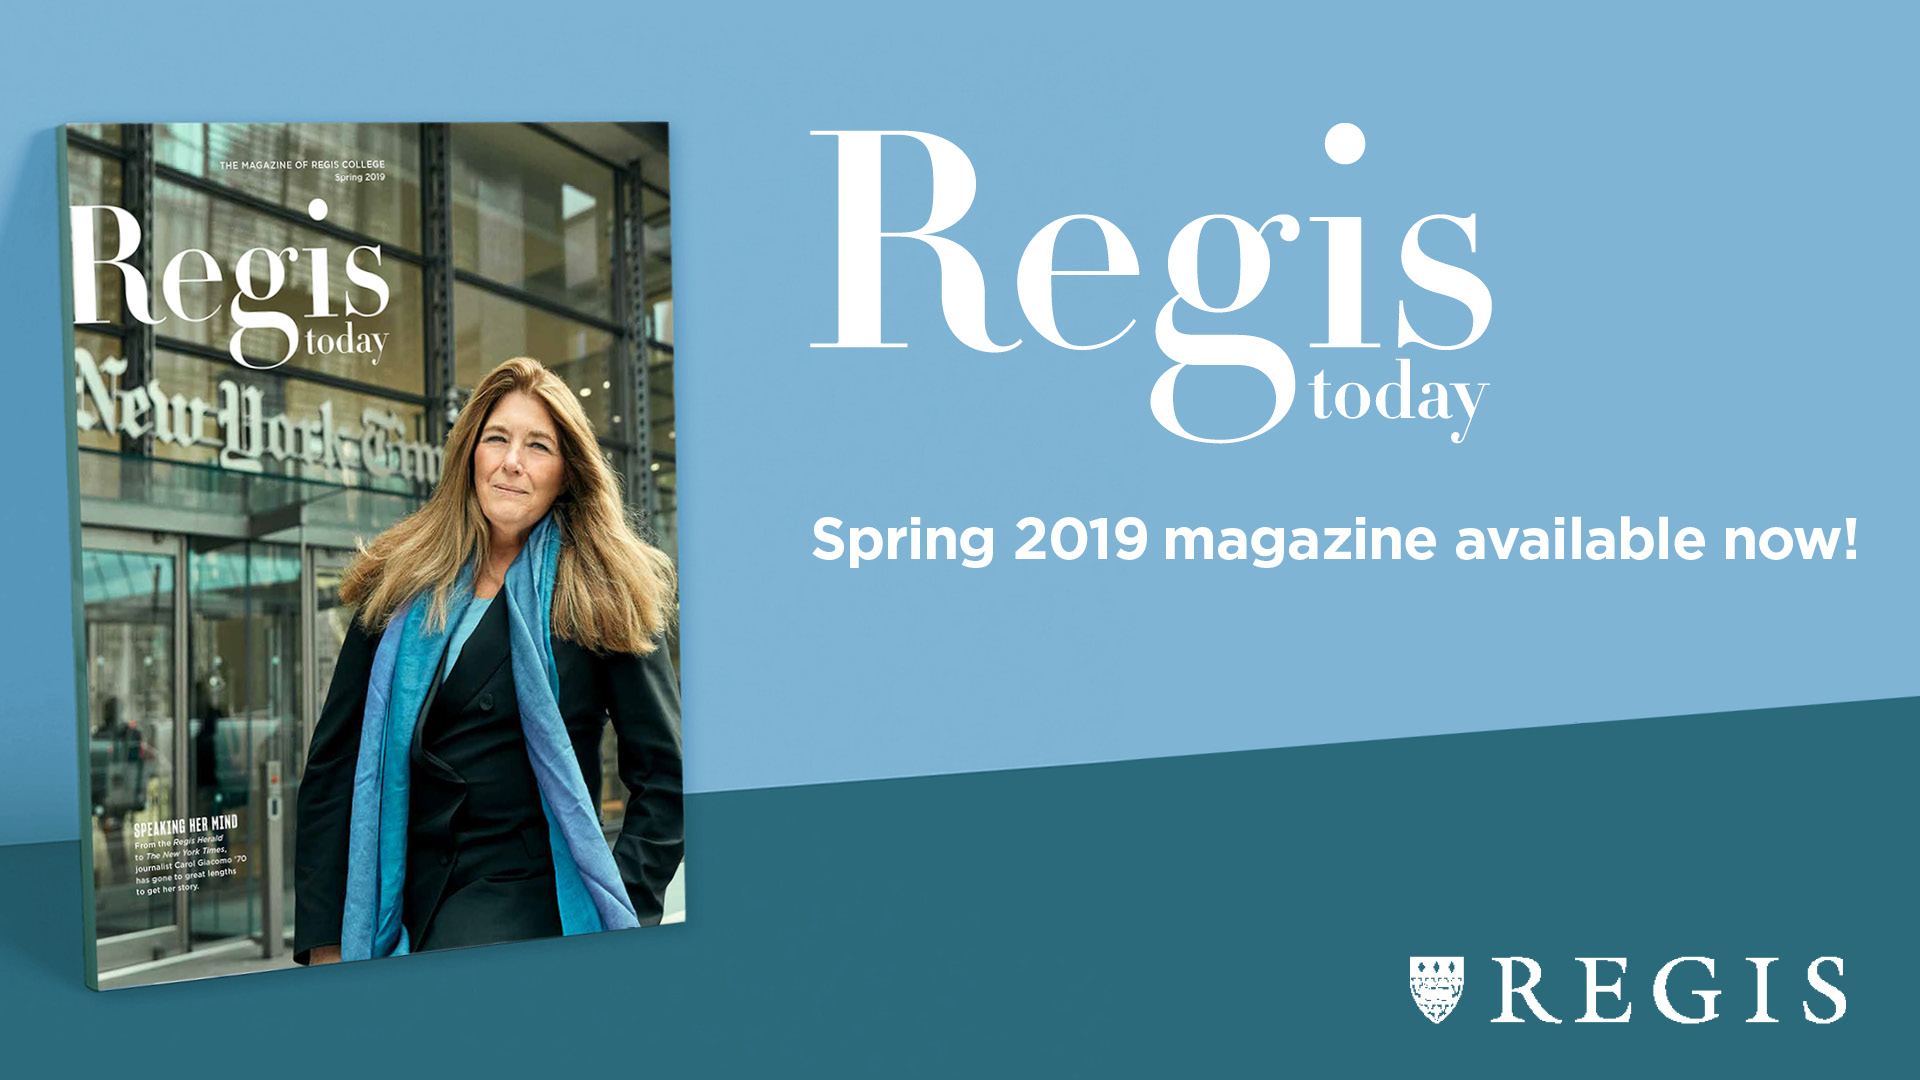 regis today magazine spring 2019